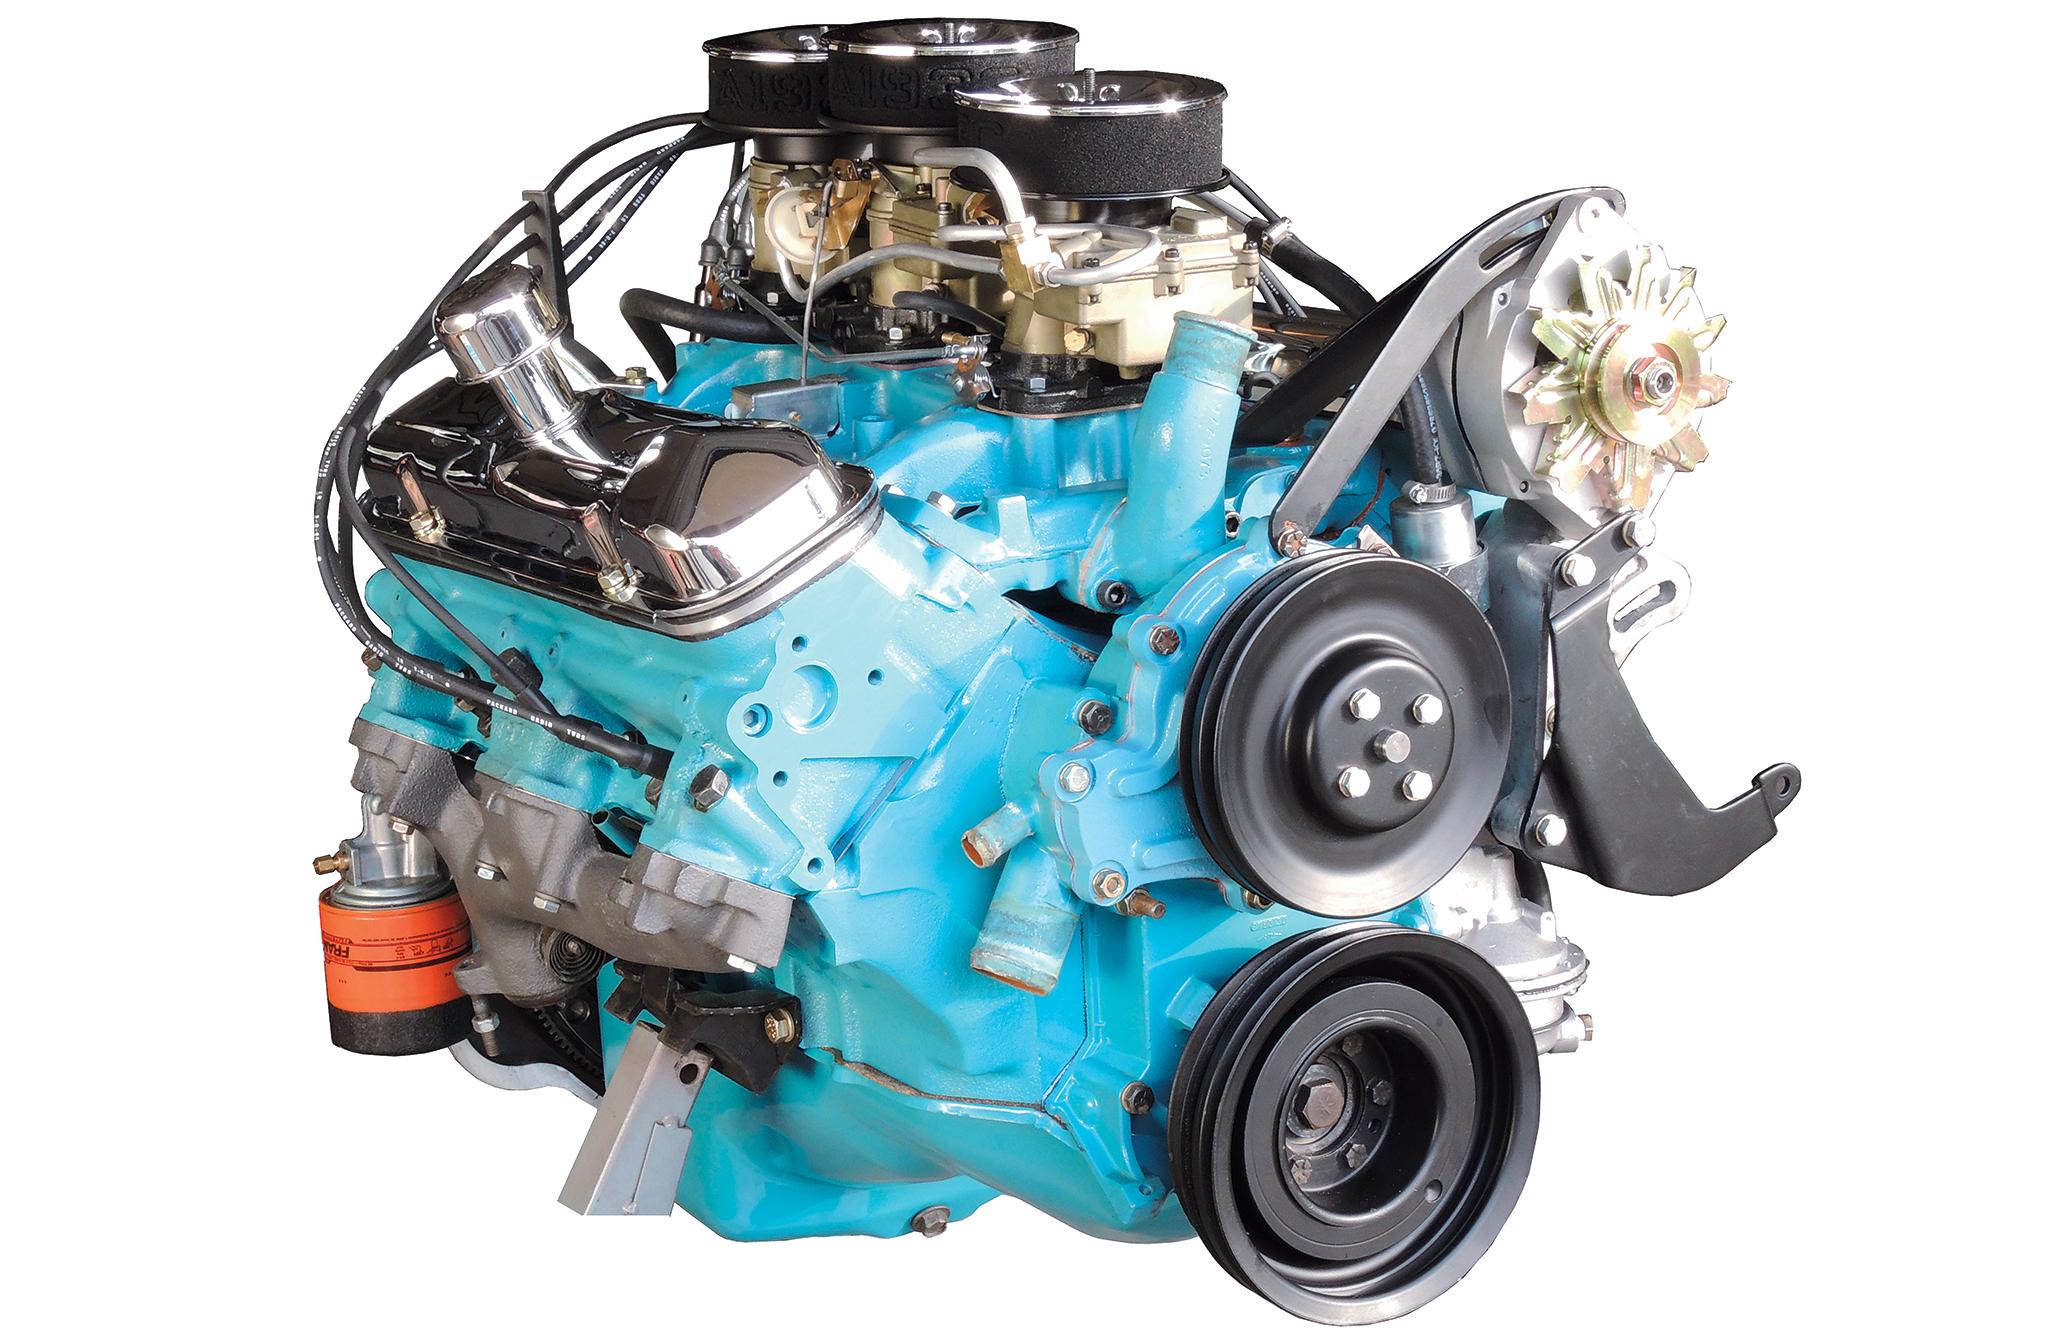 Pontiac's potent 421 cubic inch, Nascar winning 'Super Duty V8